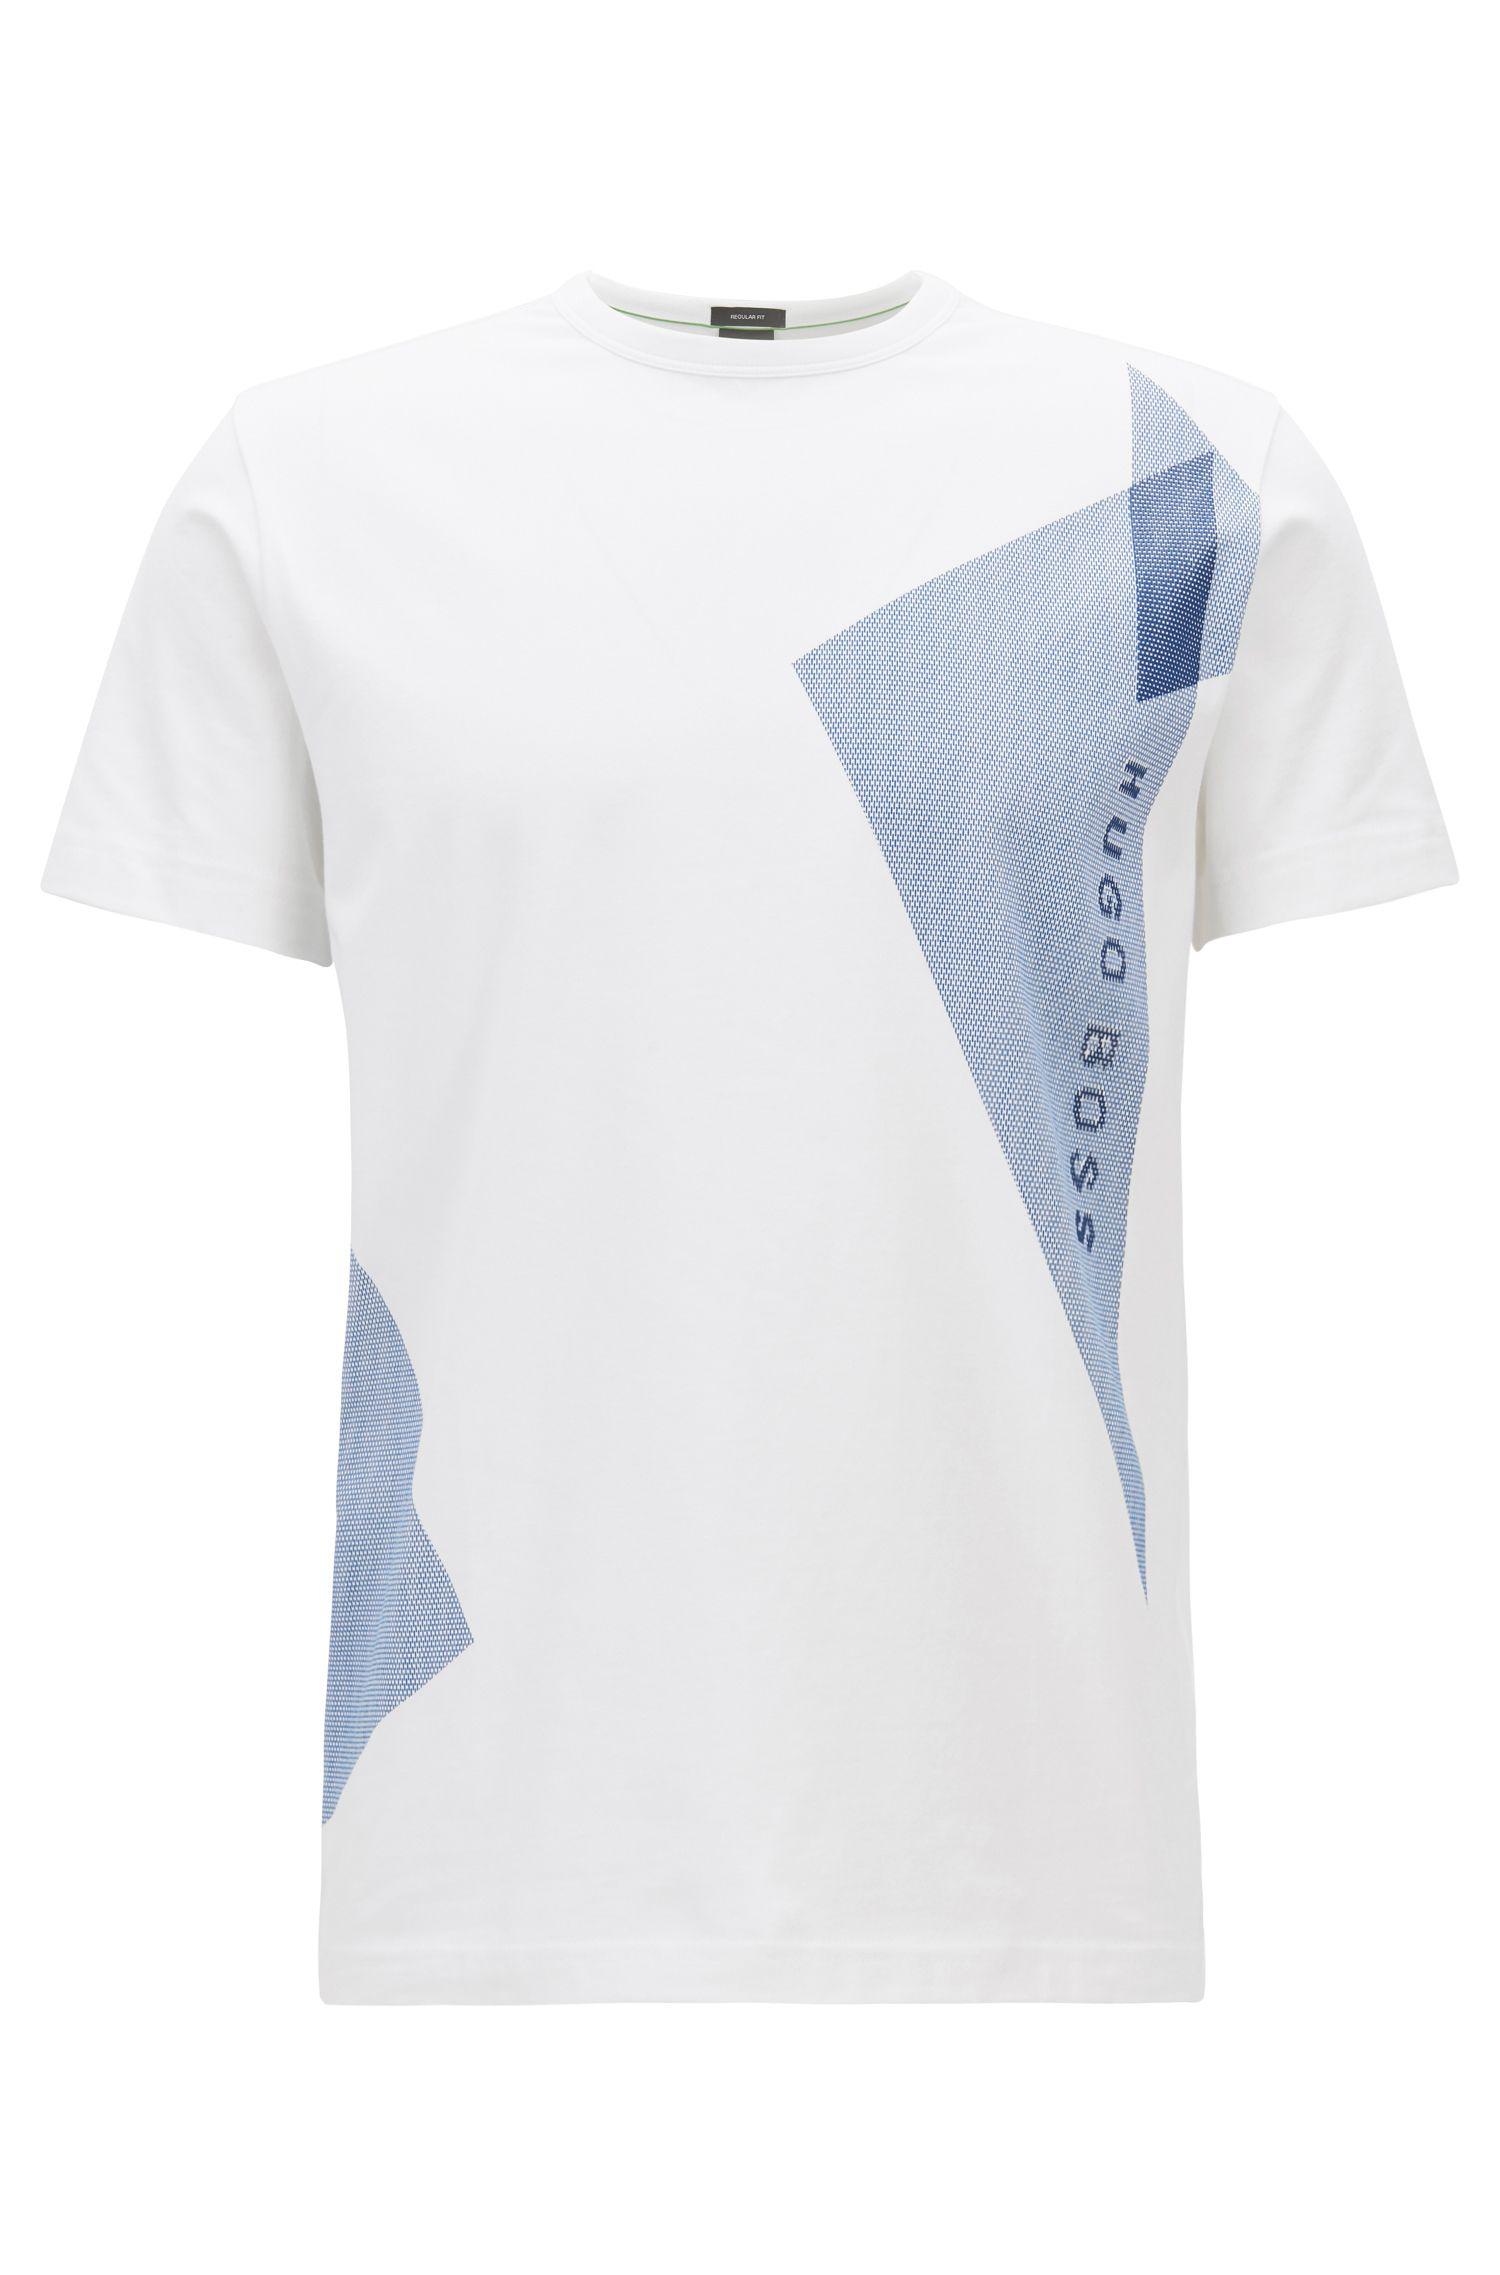 Stretch-cotton T-shirt with logo artwork